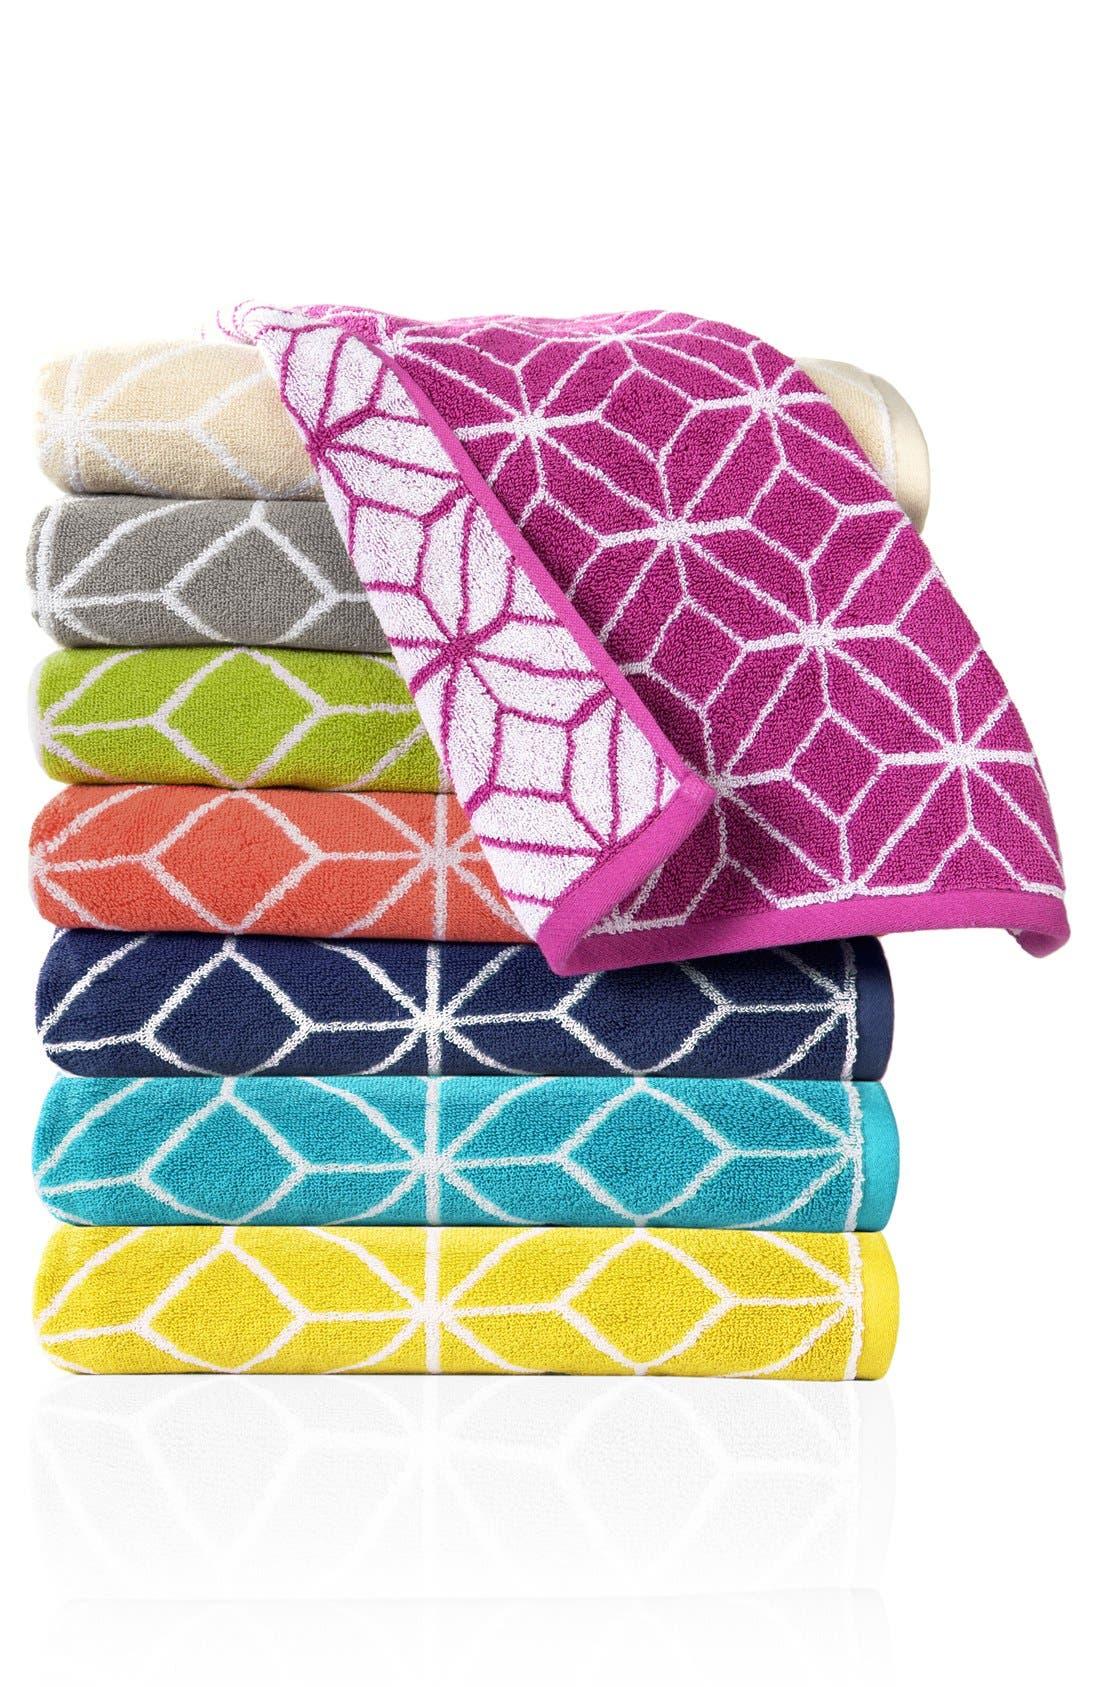 TRINA TURK 'Trellis' Bath Towel, Main, color, 020